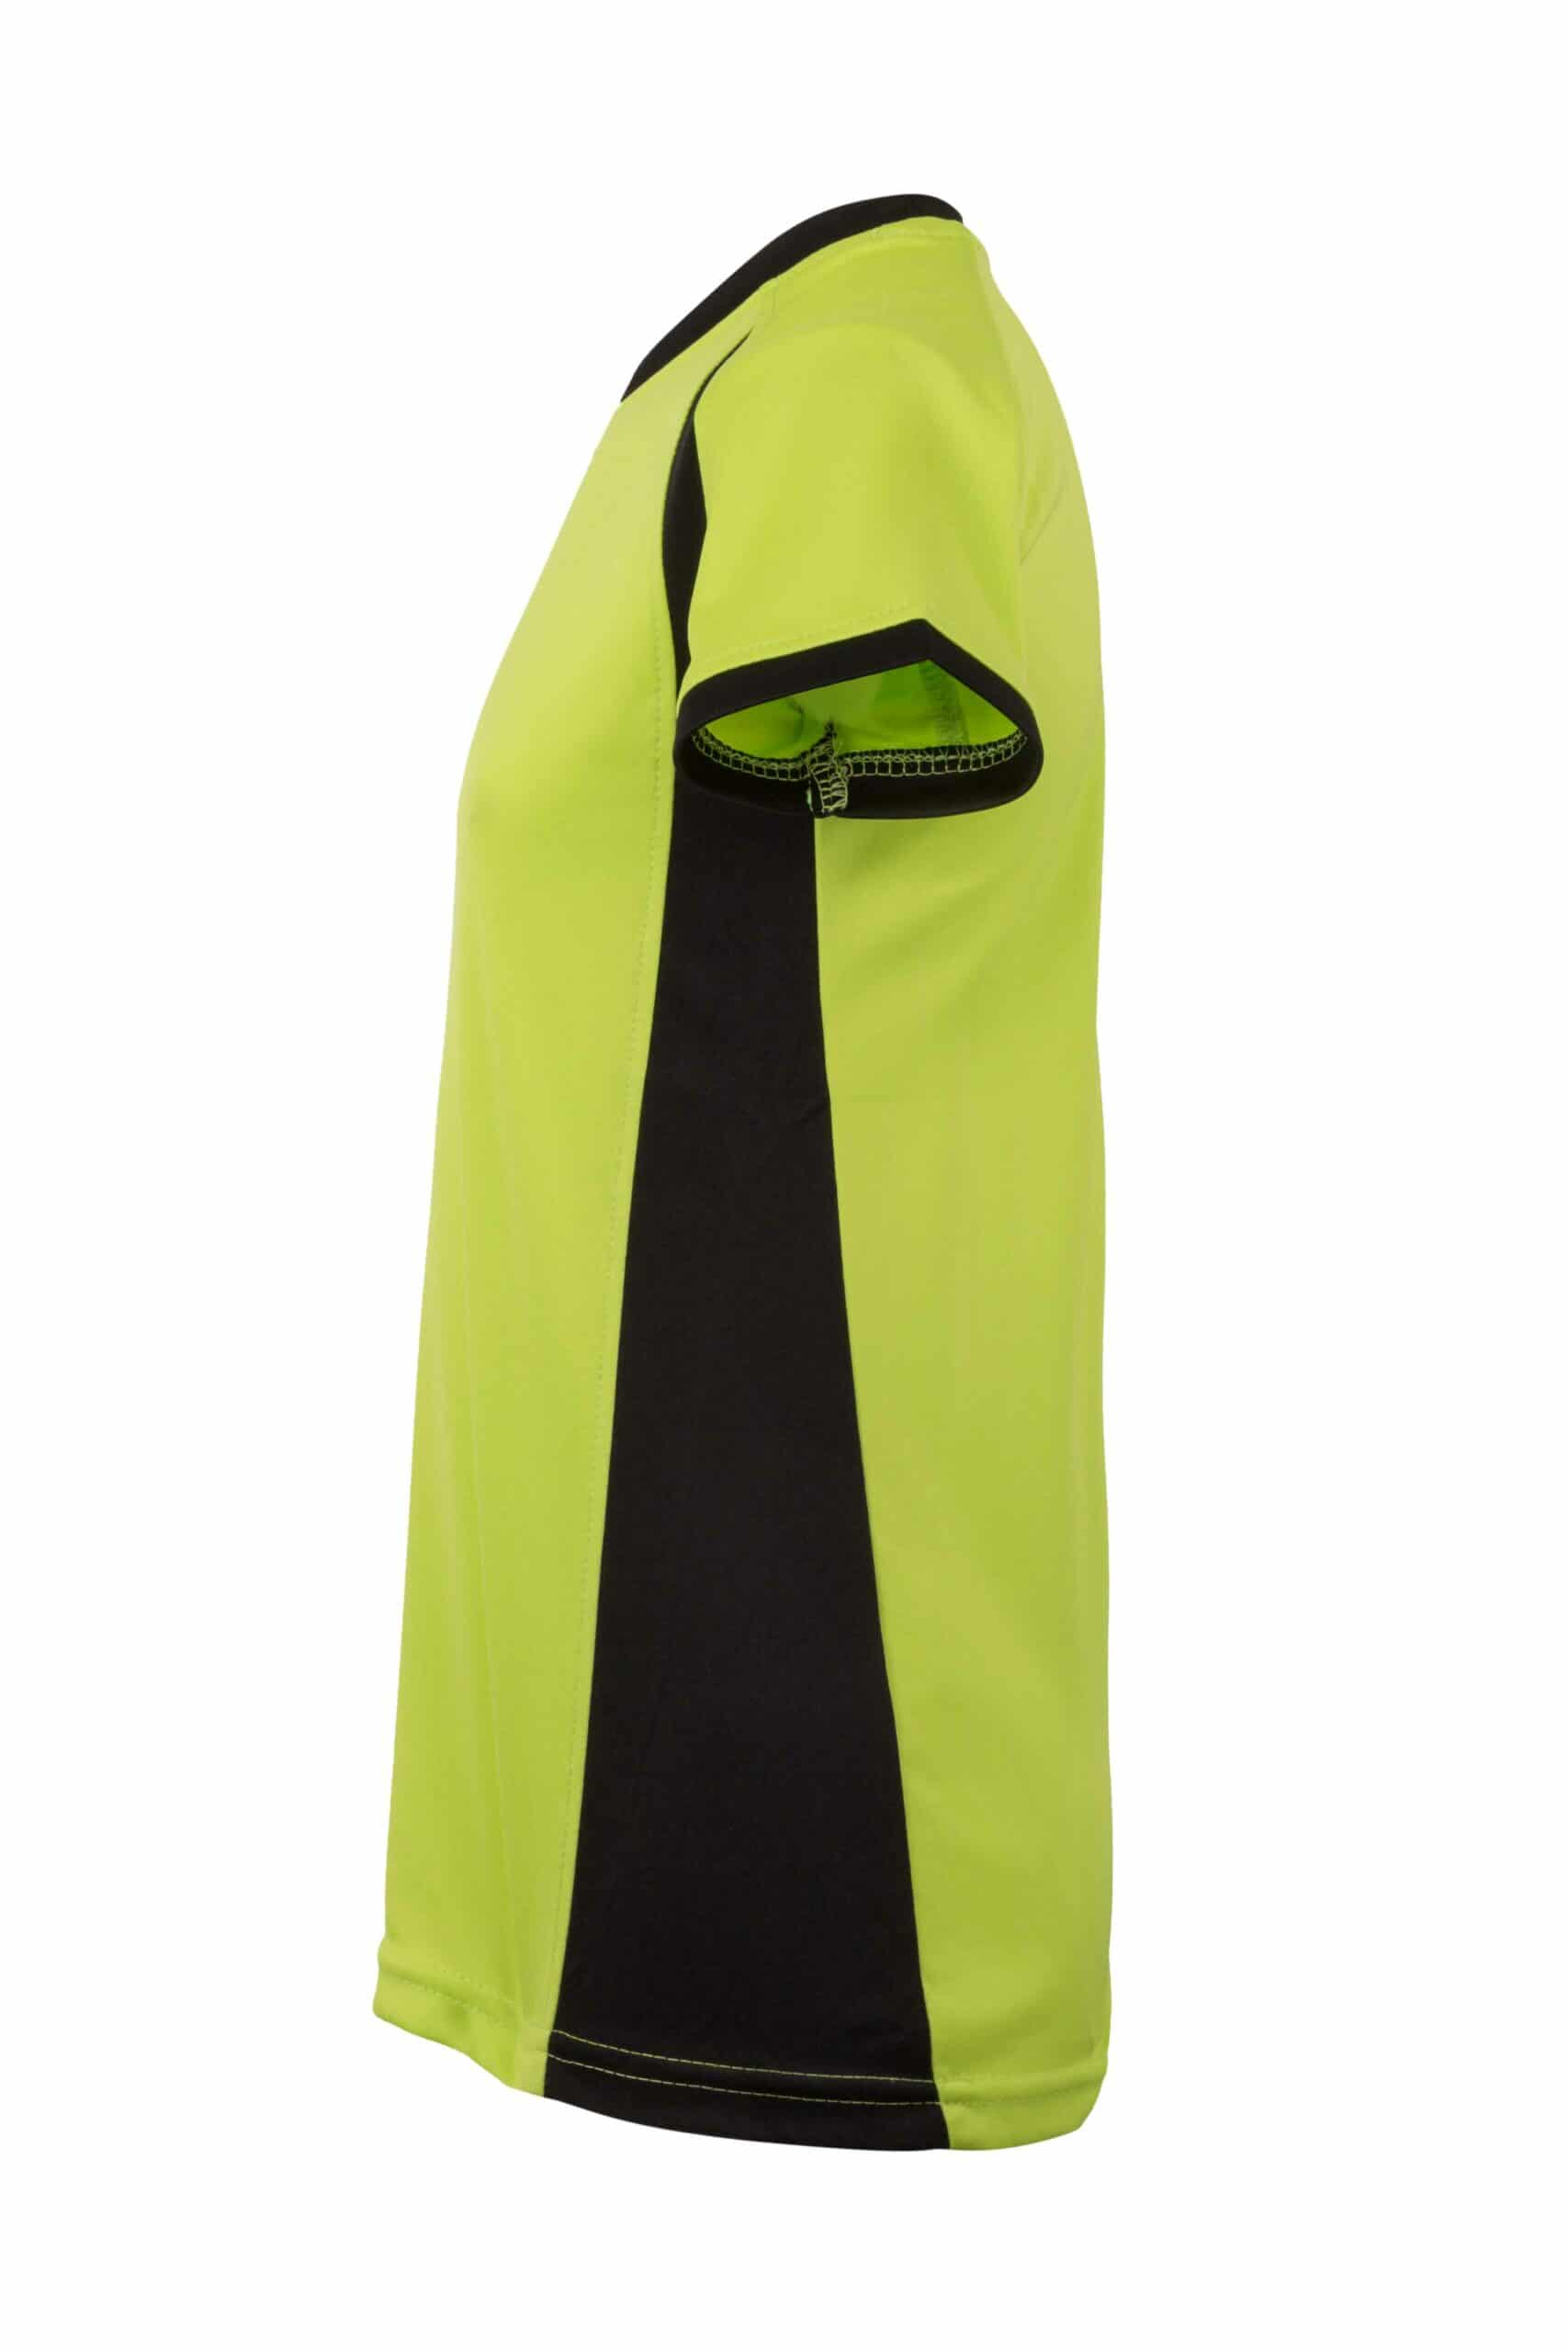 Mukua Mk531v Camiseta TÉcnica Manga Corta Bicolor NiÑo FlÚor Yellow Black 3